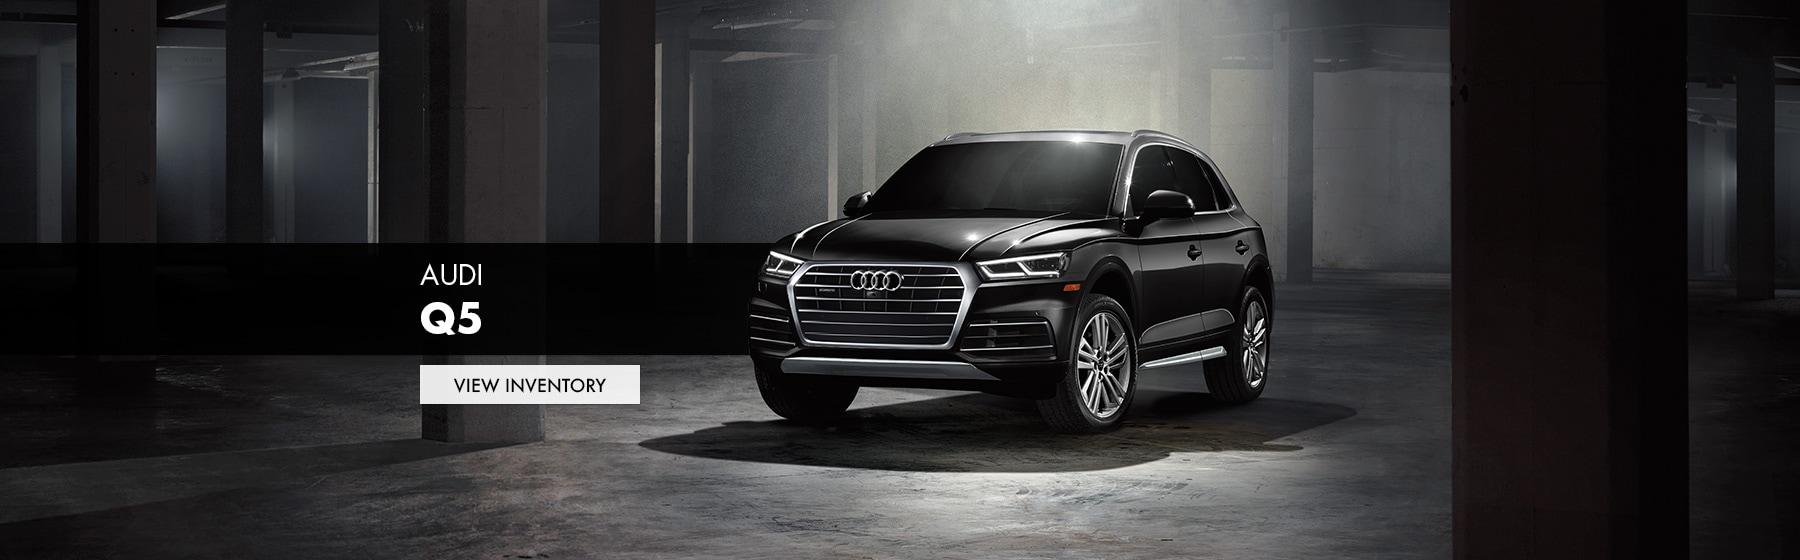 New Used Vehicles Dealer Oklahoma City Bob Moore Auto Group - Audi okc